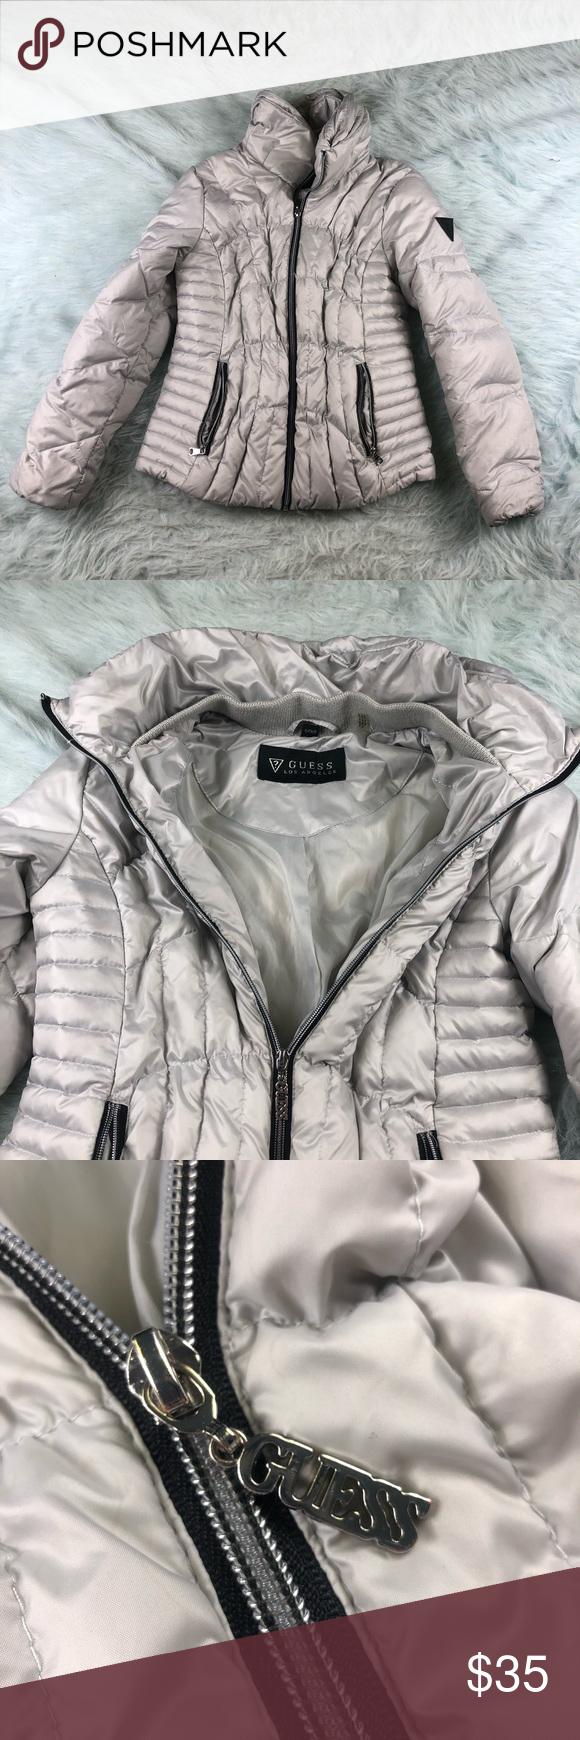 Guess Down Puffer Jacket Coat Women S Small Silver Coats For Women Coats Jackets Women Jackets [ 1740 x 580 Pixel ]